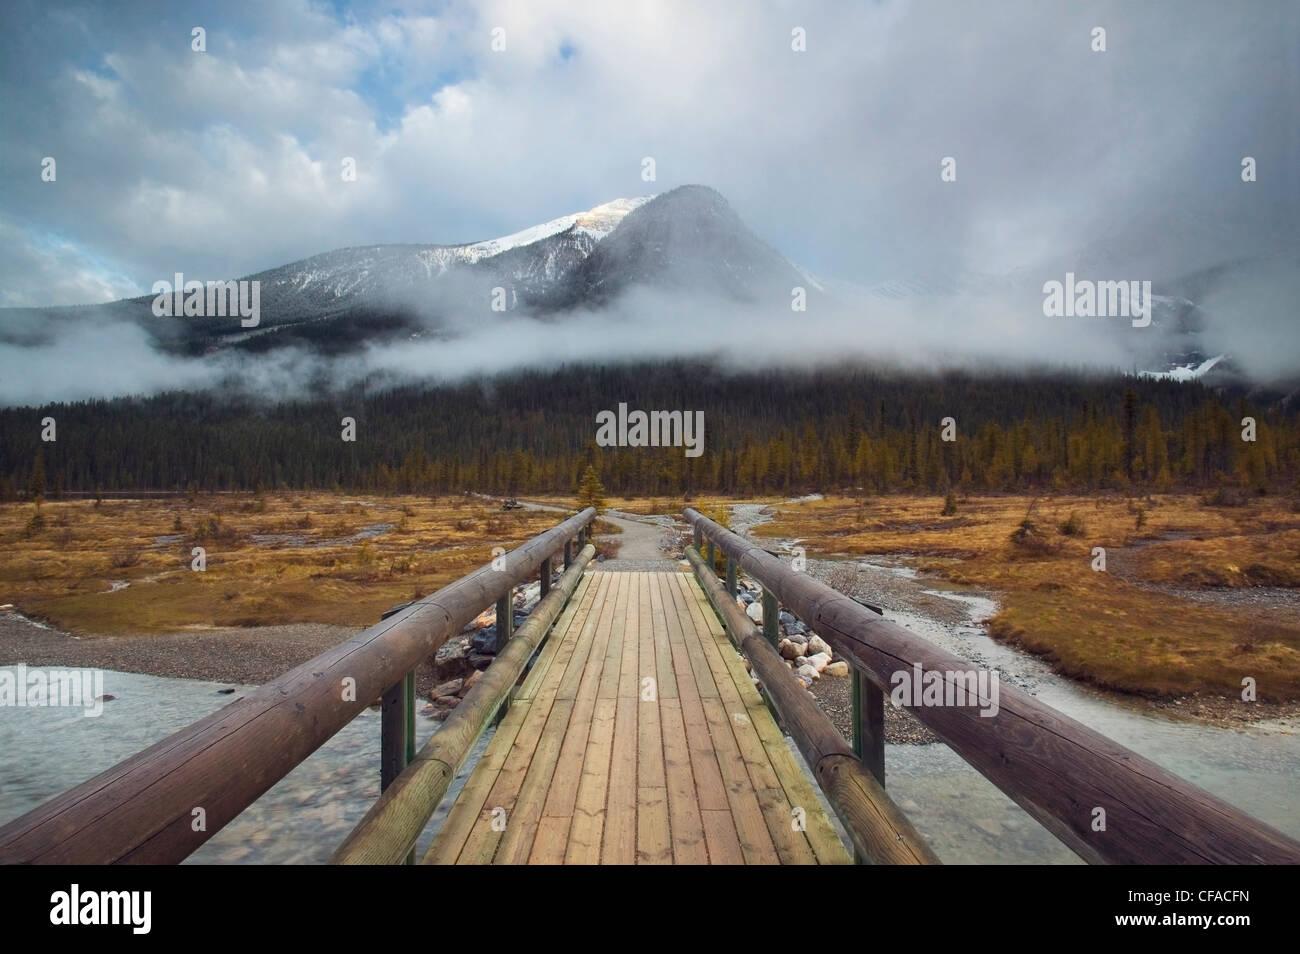 Emerald Gipfel und Brücke entlang der Emerald Lake Circuit. Yoho Nationalpark, Britisch-Kolumbien, Kanada. Stockbild